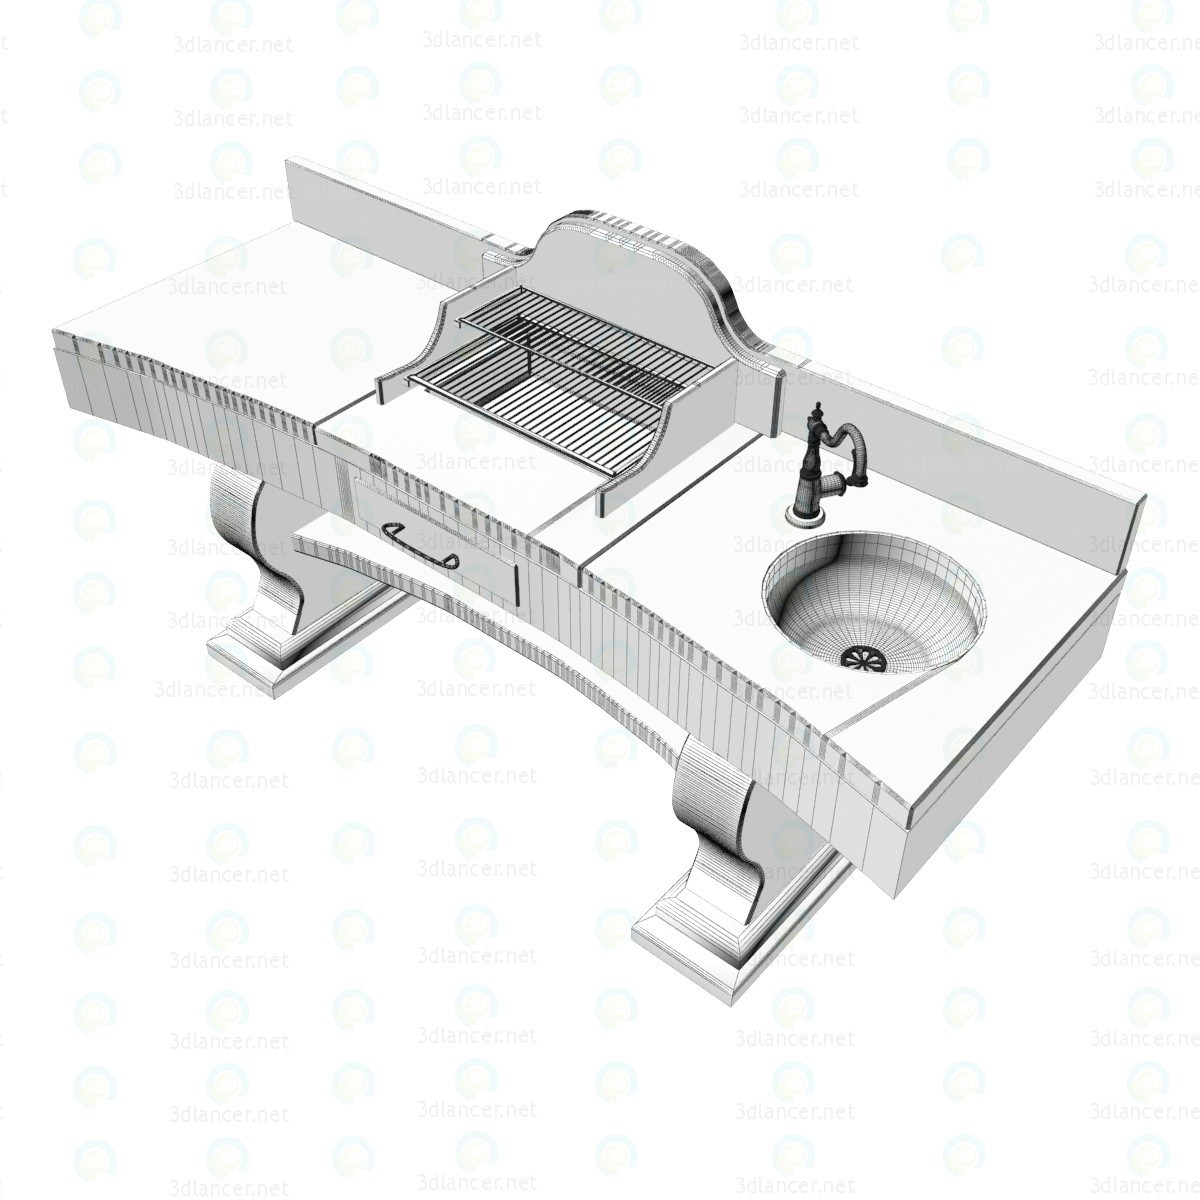 Barbacoa casa Lazzerini 3D modelo Compro - render